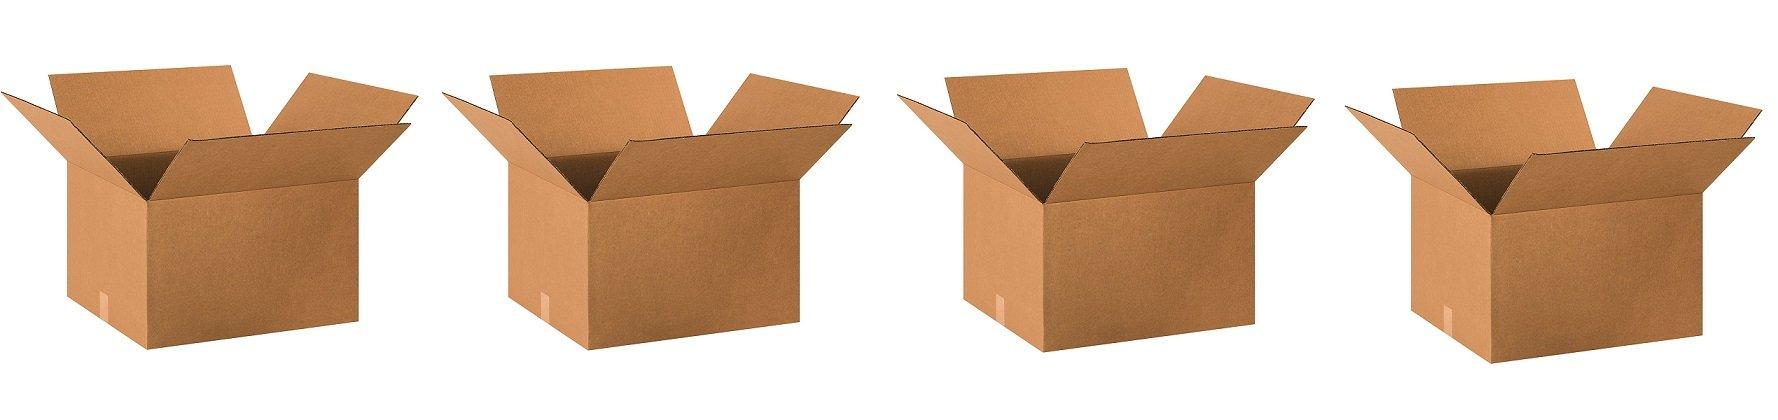 Aviditi 201812 Single-Wall Corrugated Box, 20'' Length x 18'' Width x 12'' Height, Kraft (Bundle of 10) (4-(Bundle of 10))